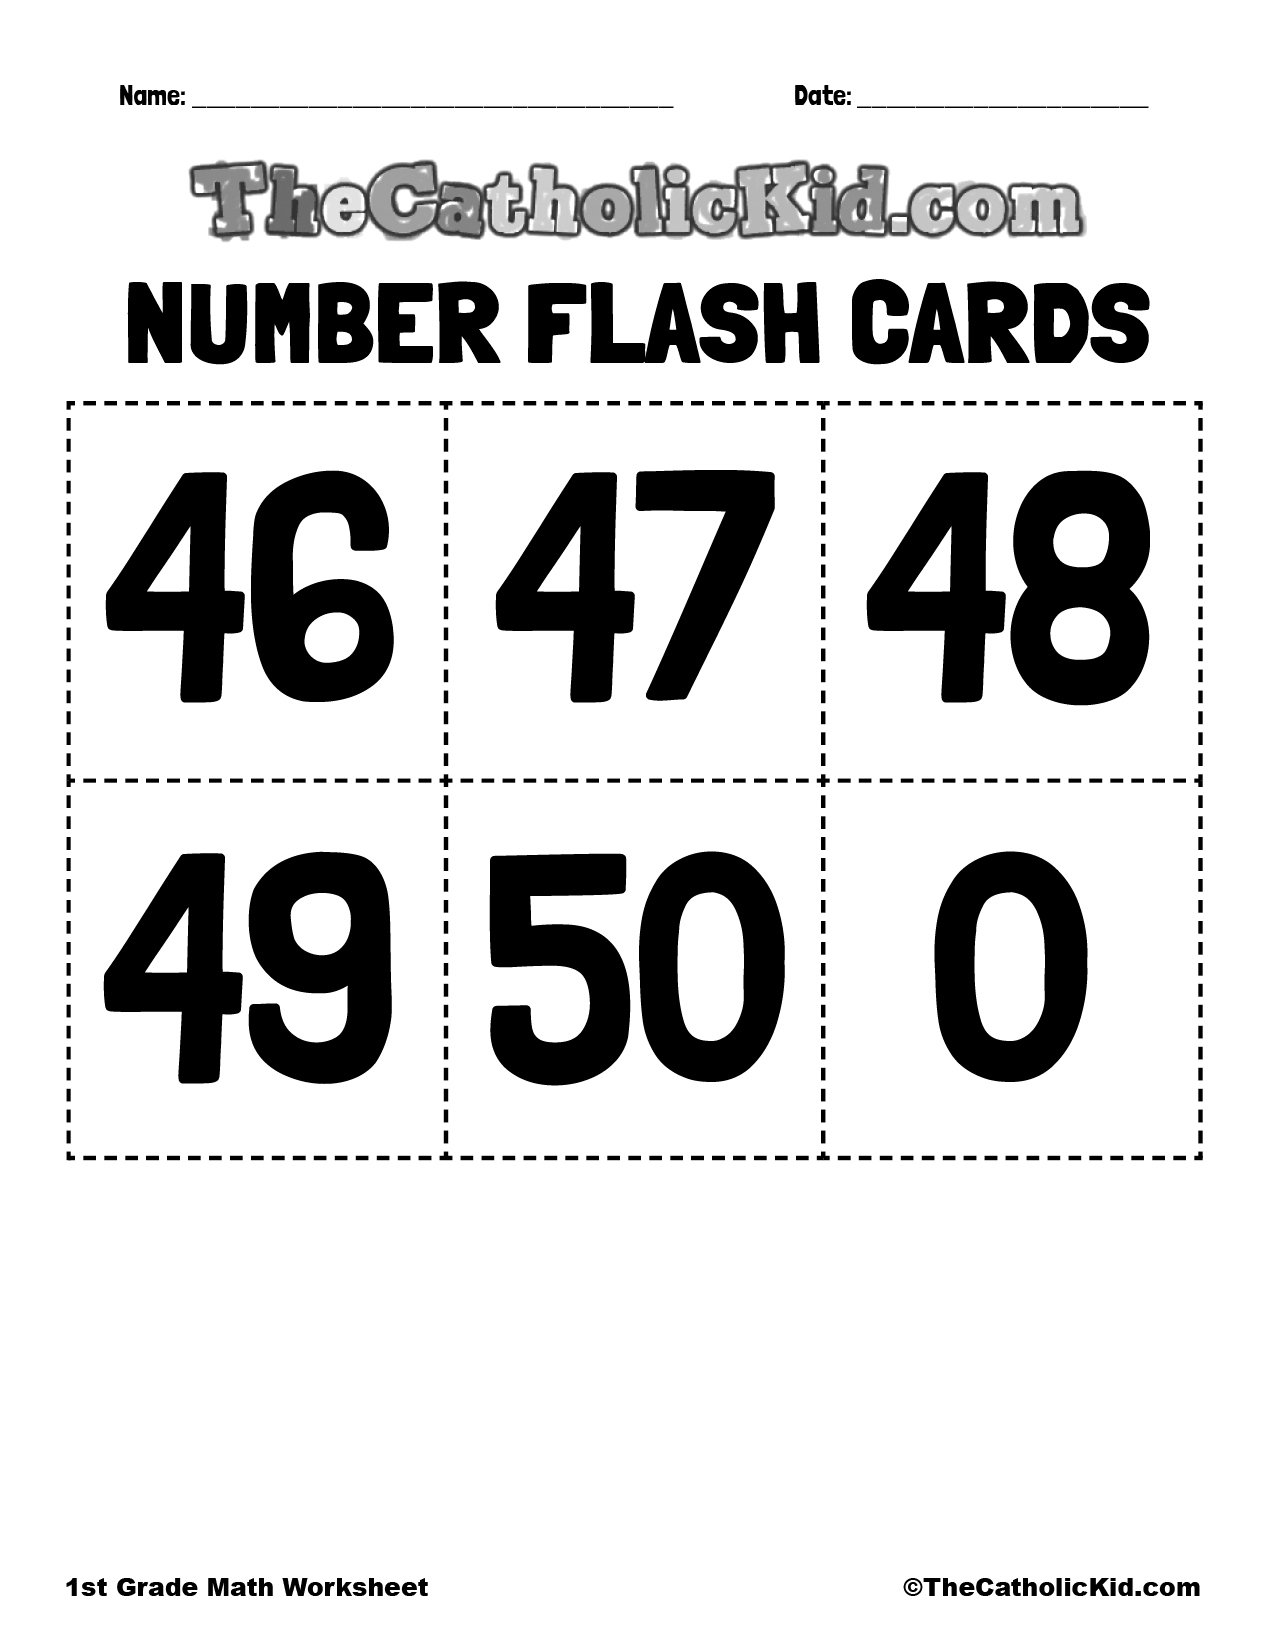 Number Flash Cards 46-50 - 1st Grade Math Worksheet Catholic